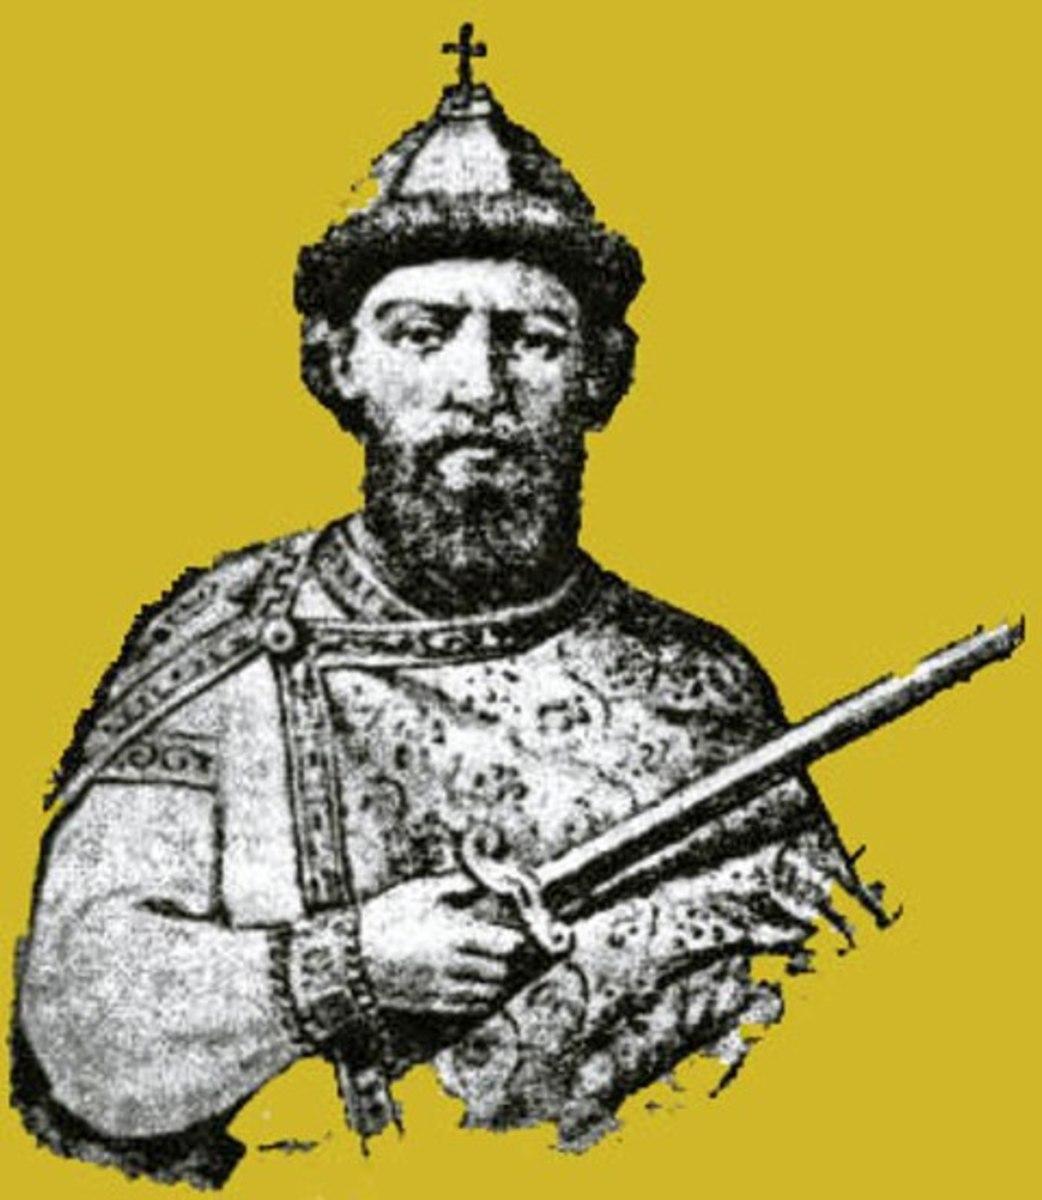 Gytha's son by Valdemar (Vladimir), Msistislav Harold - sire of several dynasties in northern Europe and Scandinavia down to the present Windsor dynasty